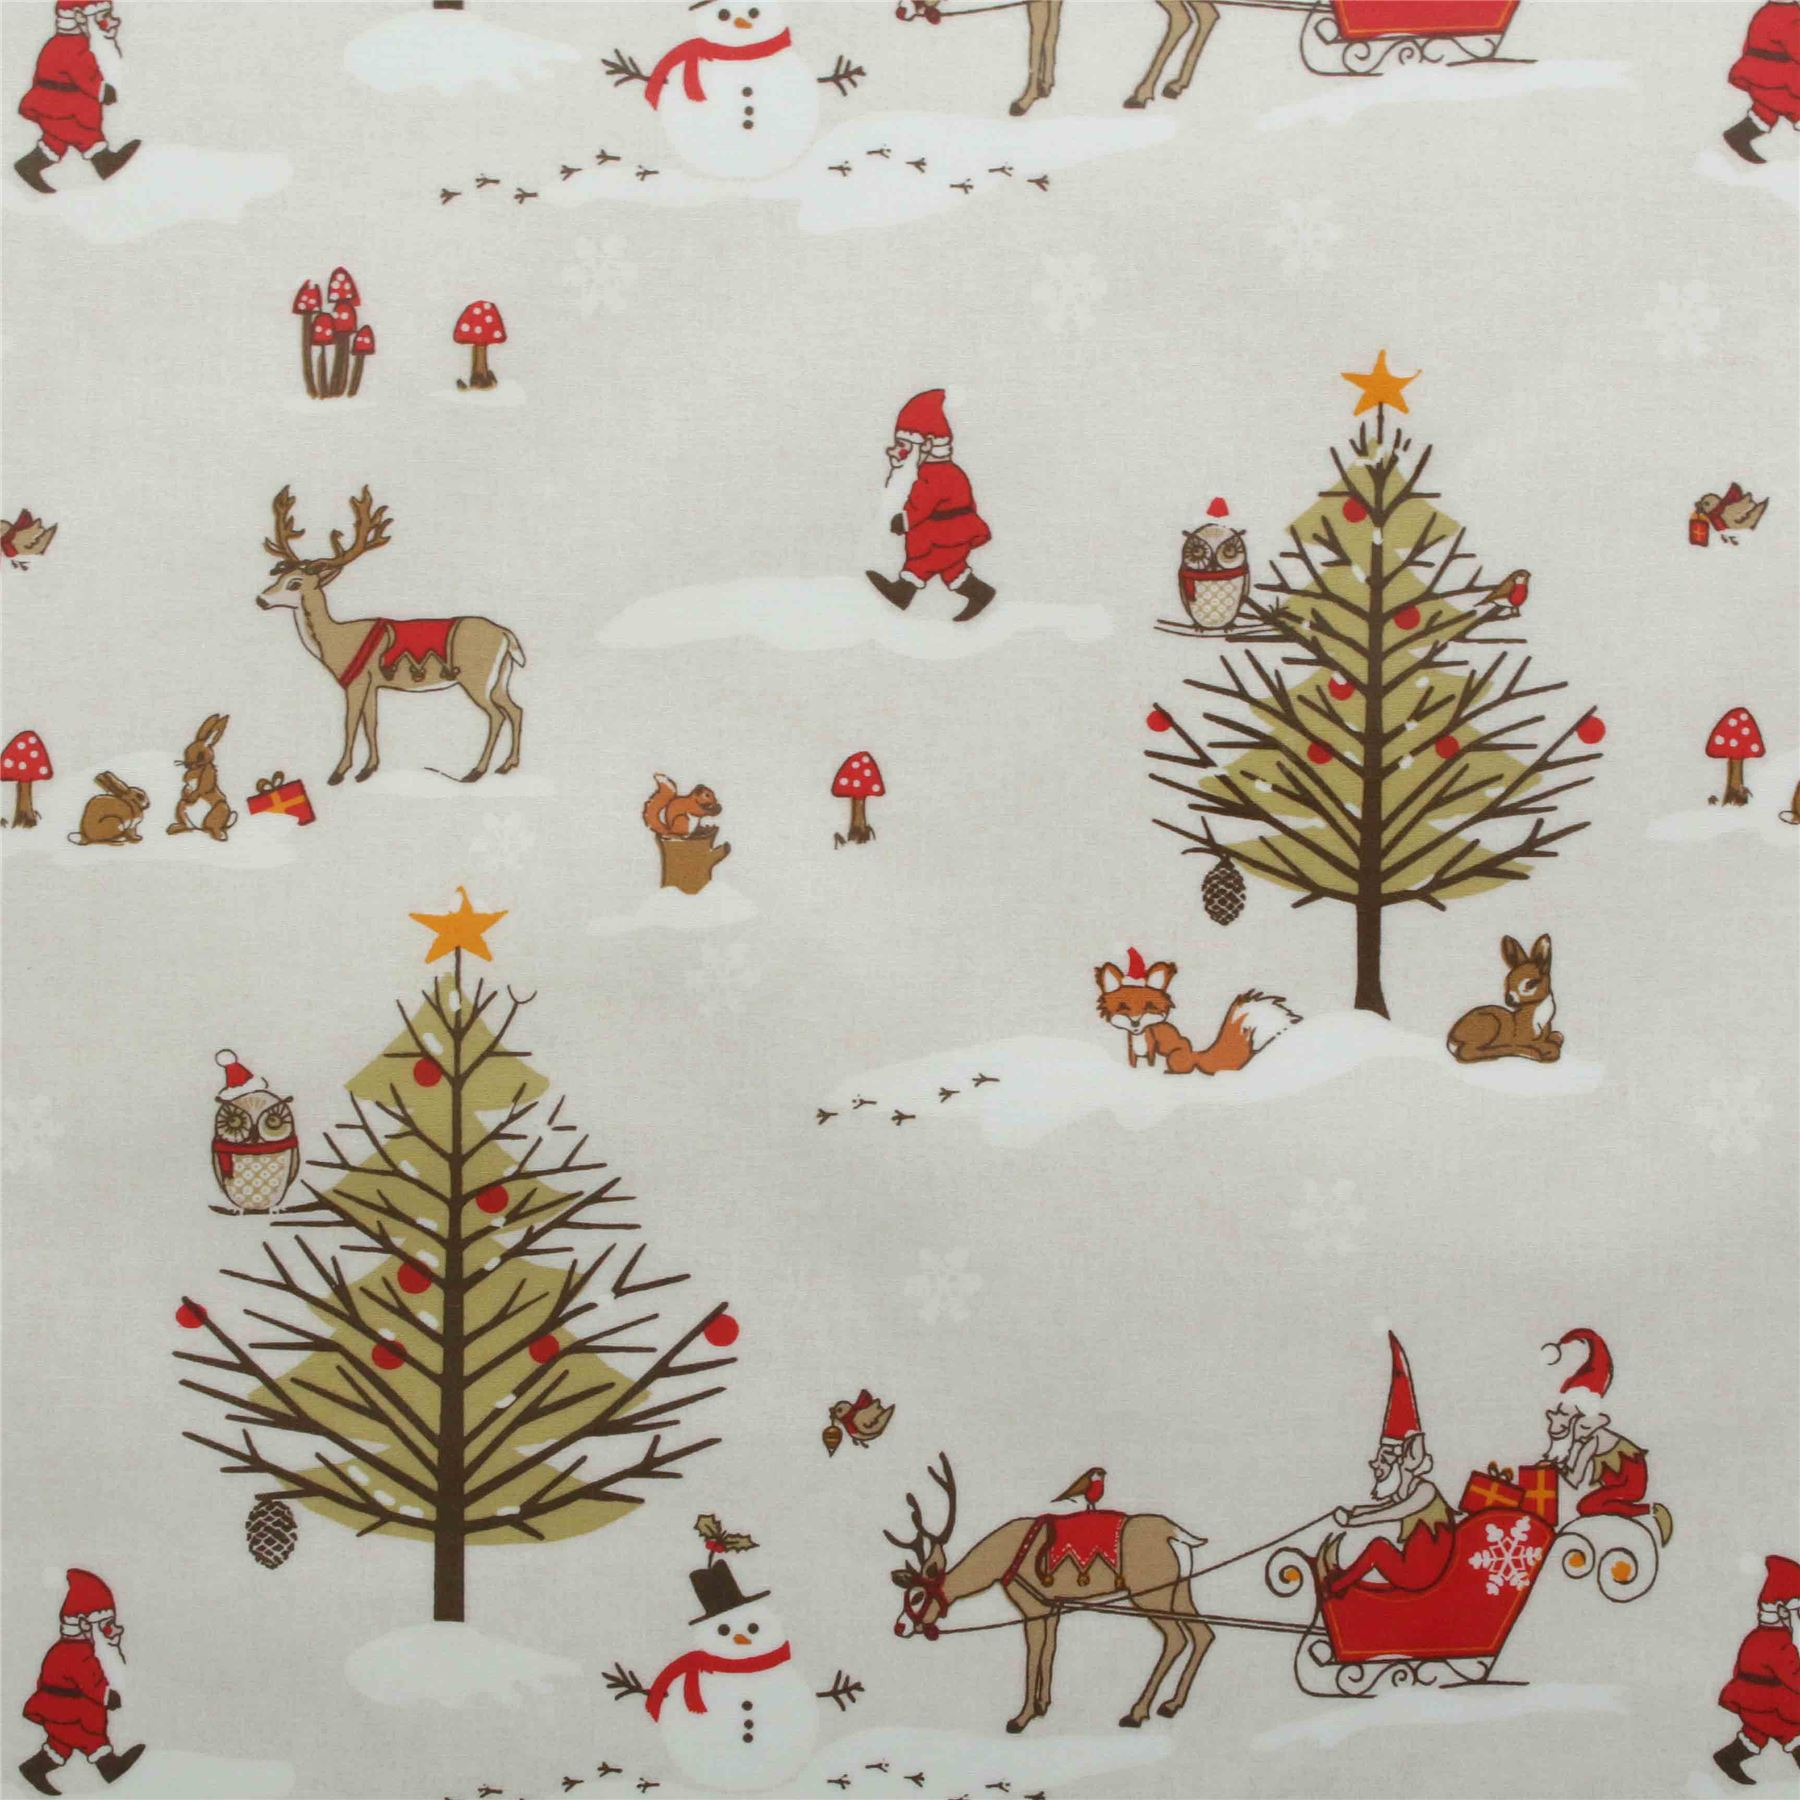 Xmas Vintage Christmas Santa Cotton Wipeclean PVC Tablecloth ...